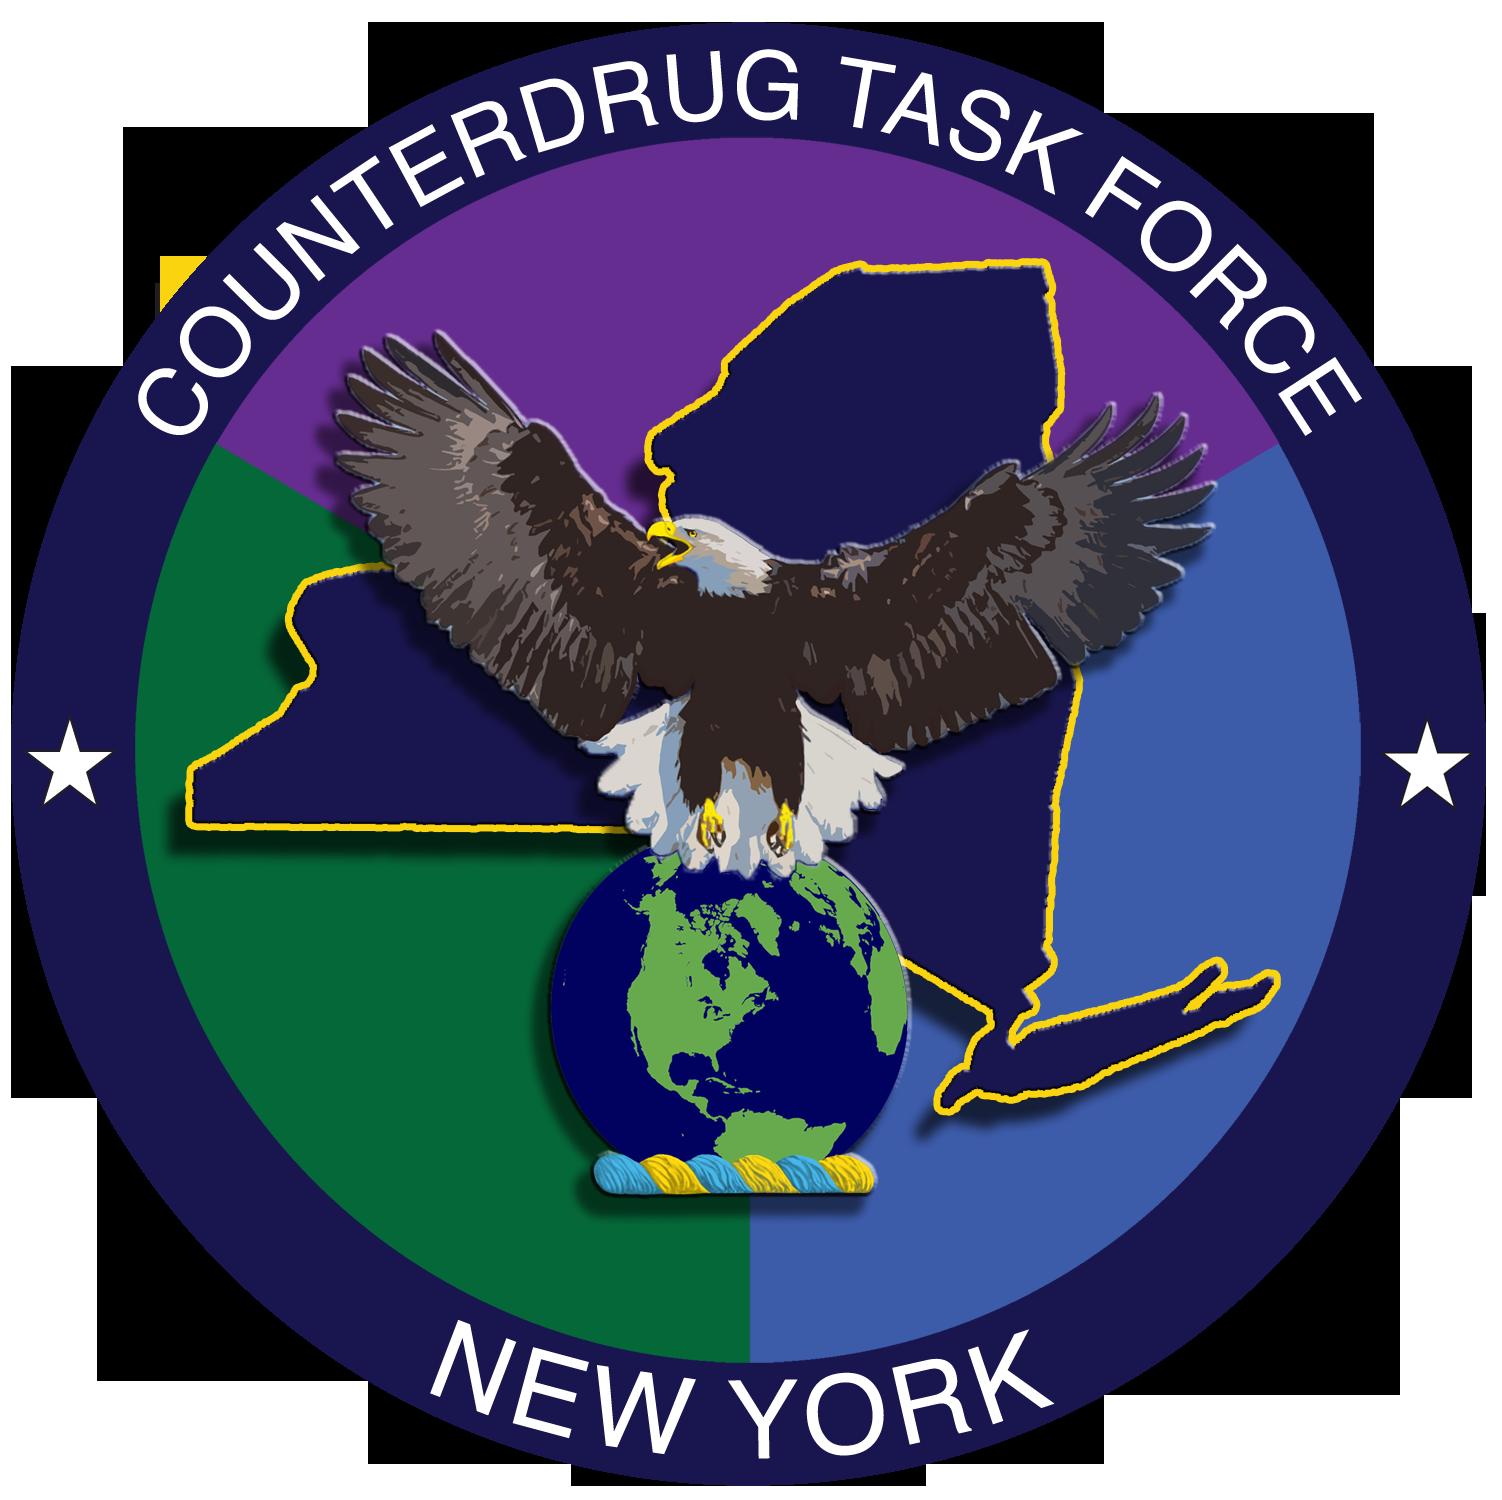 National Guard Counterdrug Task Force